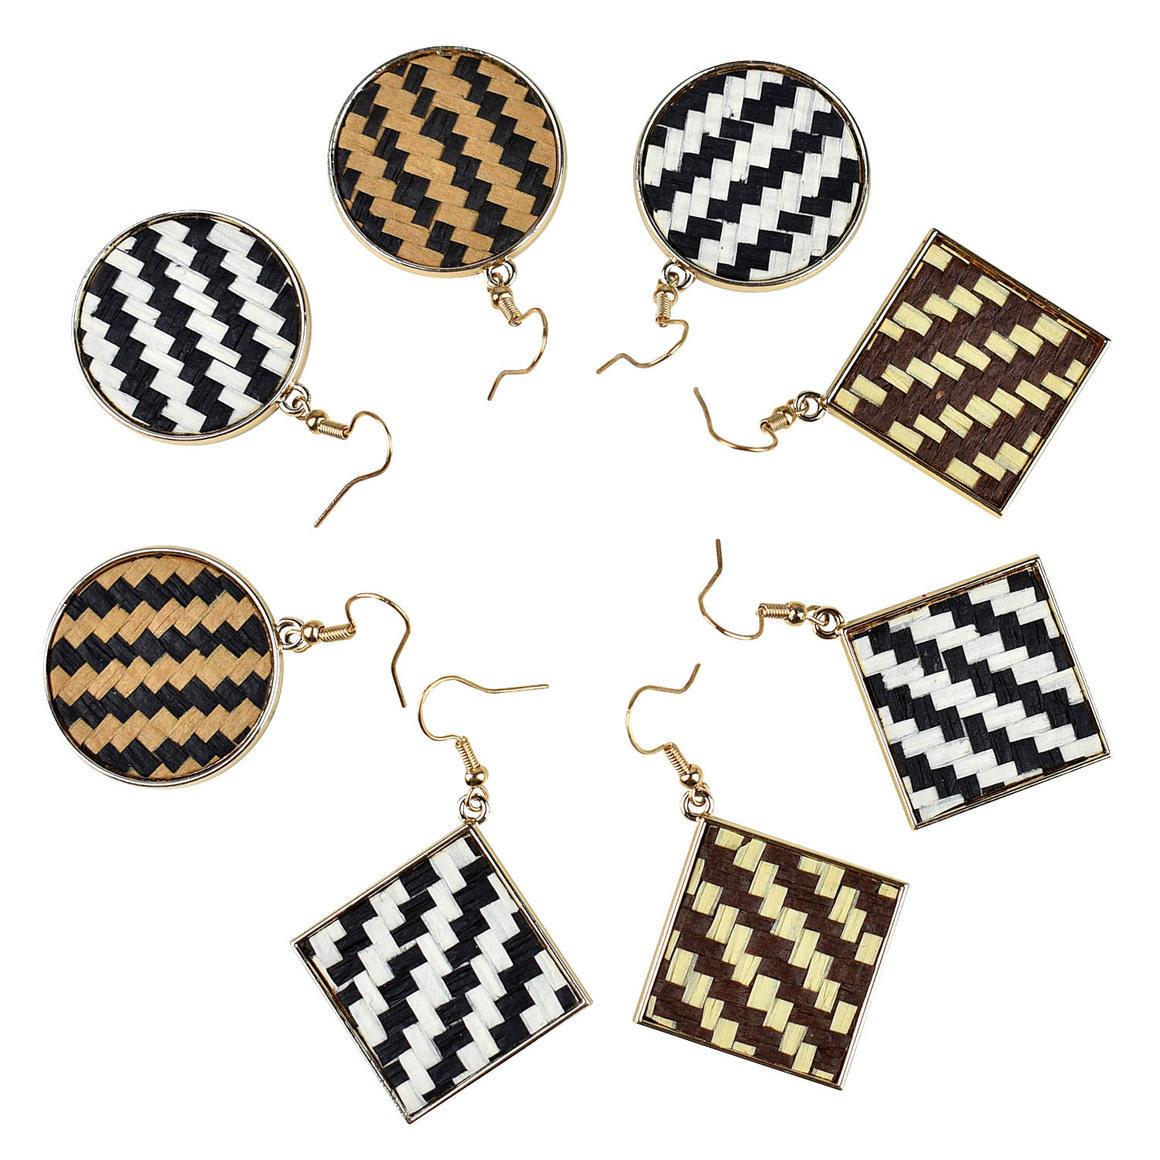 THSAP1334: Weaved Earrings (5pcs) Pack | Trada Marketplace